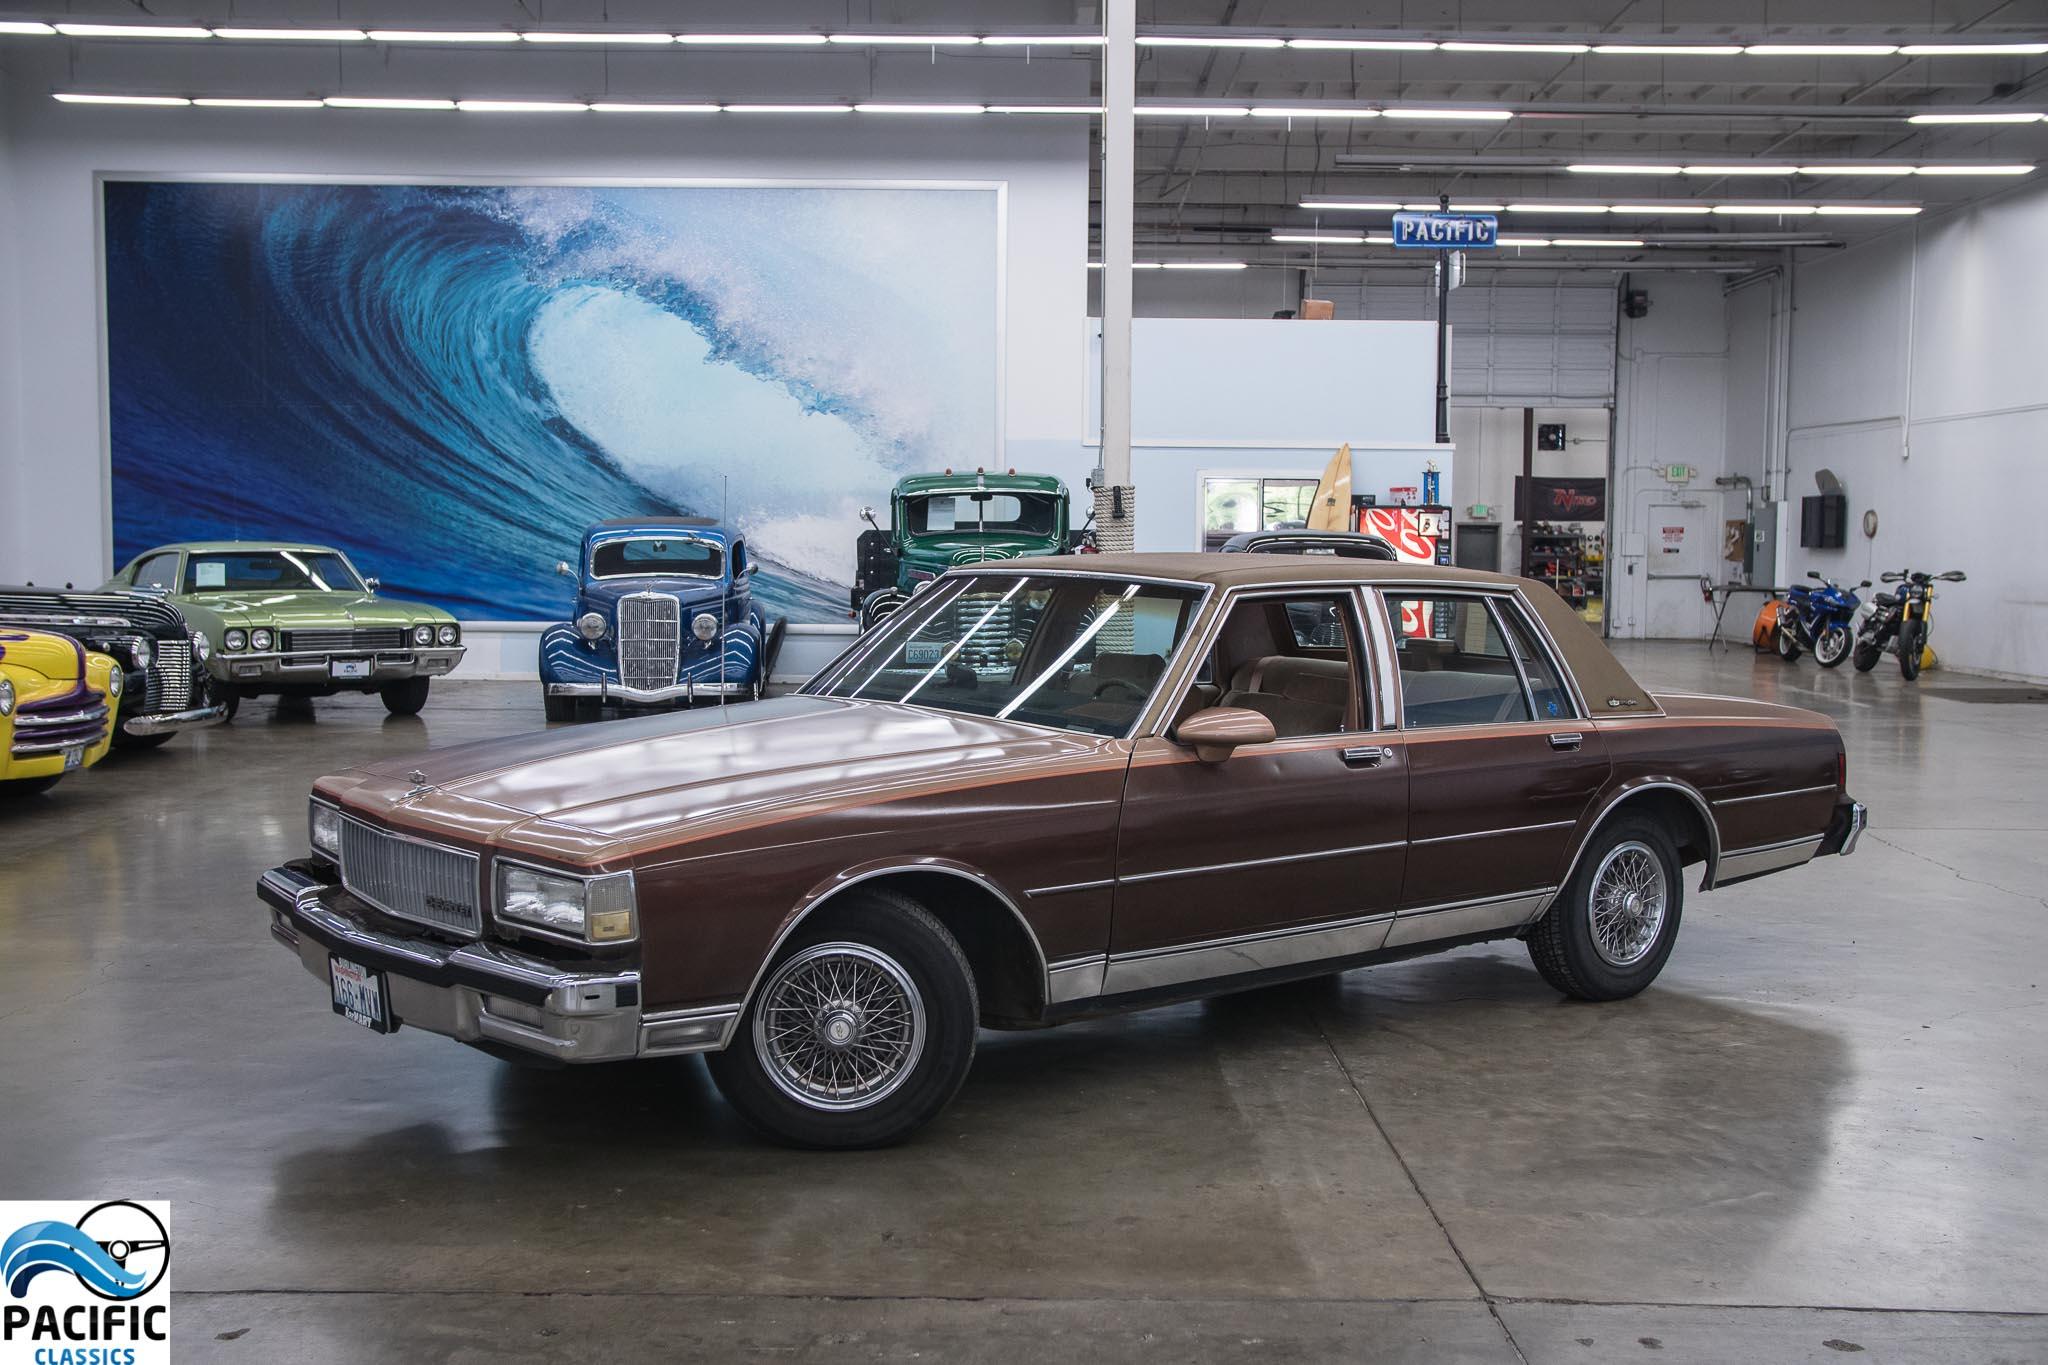 1989 Chevrolet Caprice Brougham